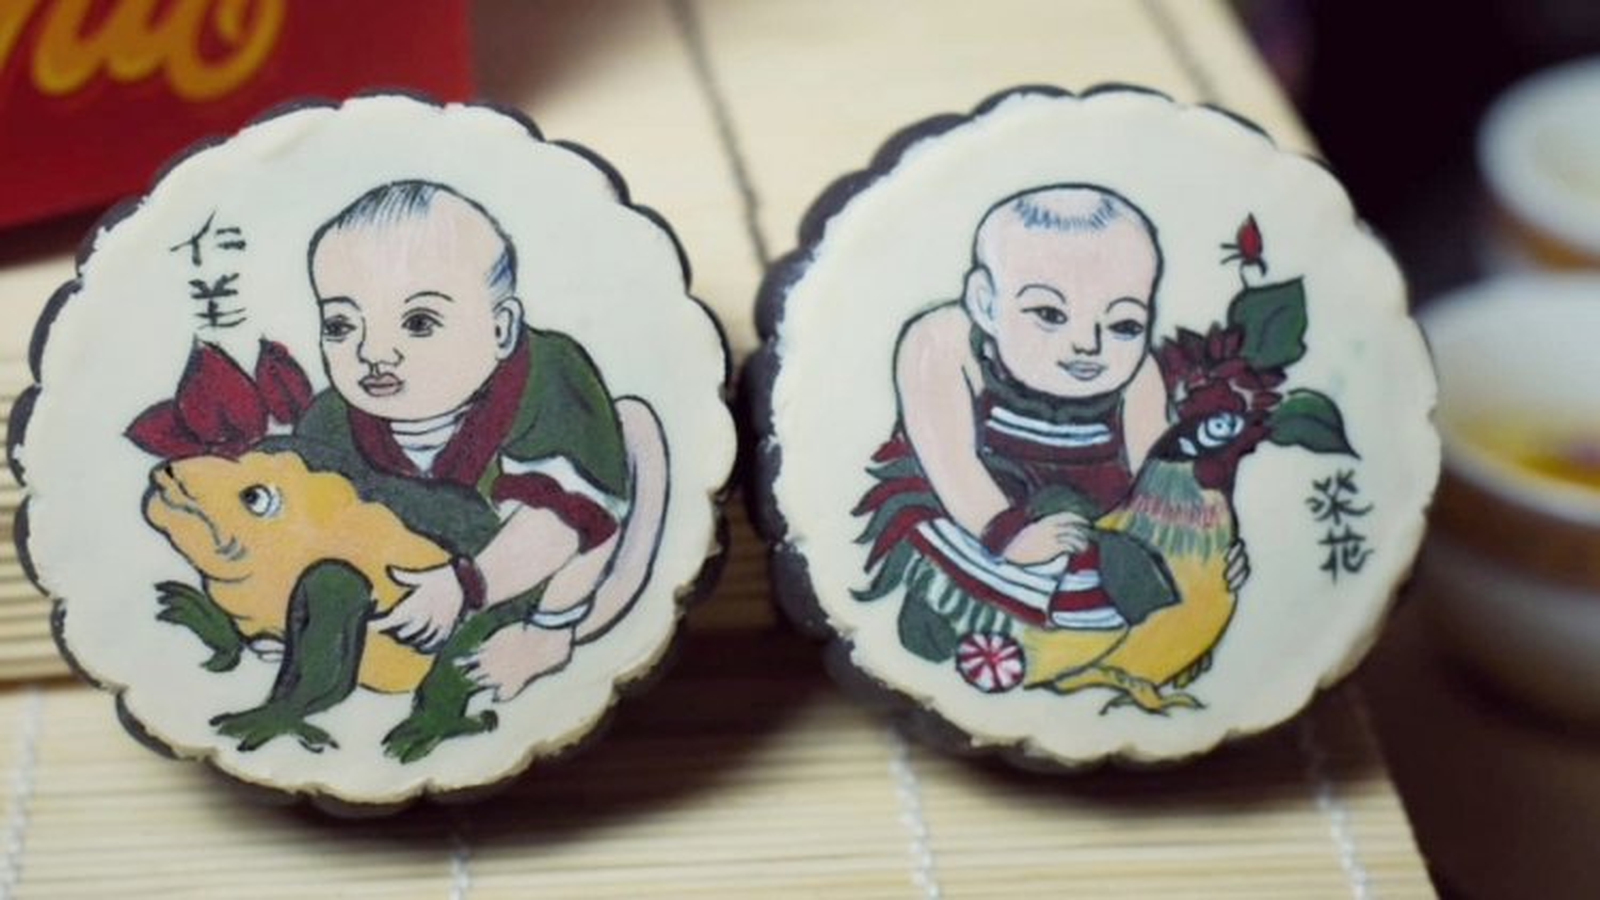 Unique moon cakes hit market ahead of Full Moon Festival